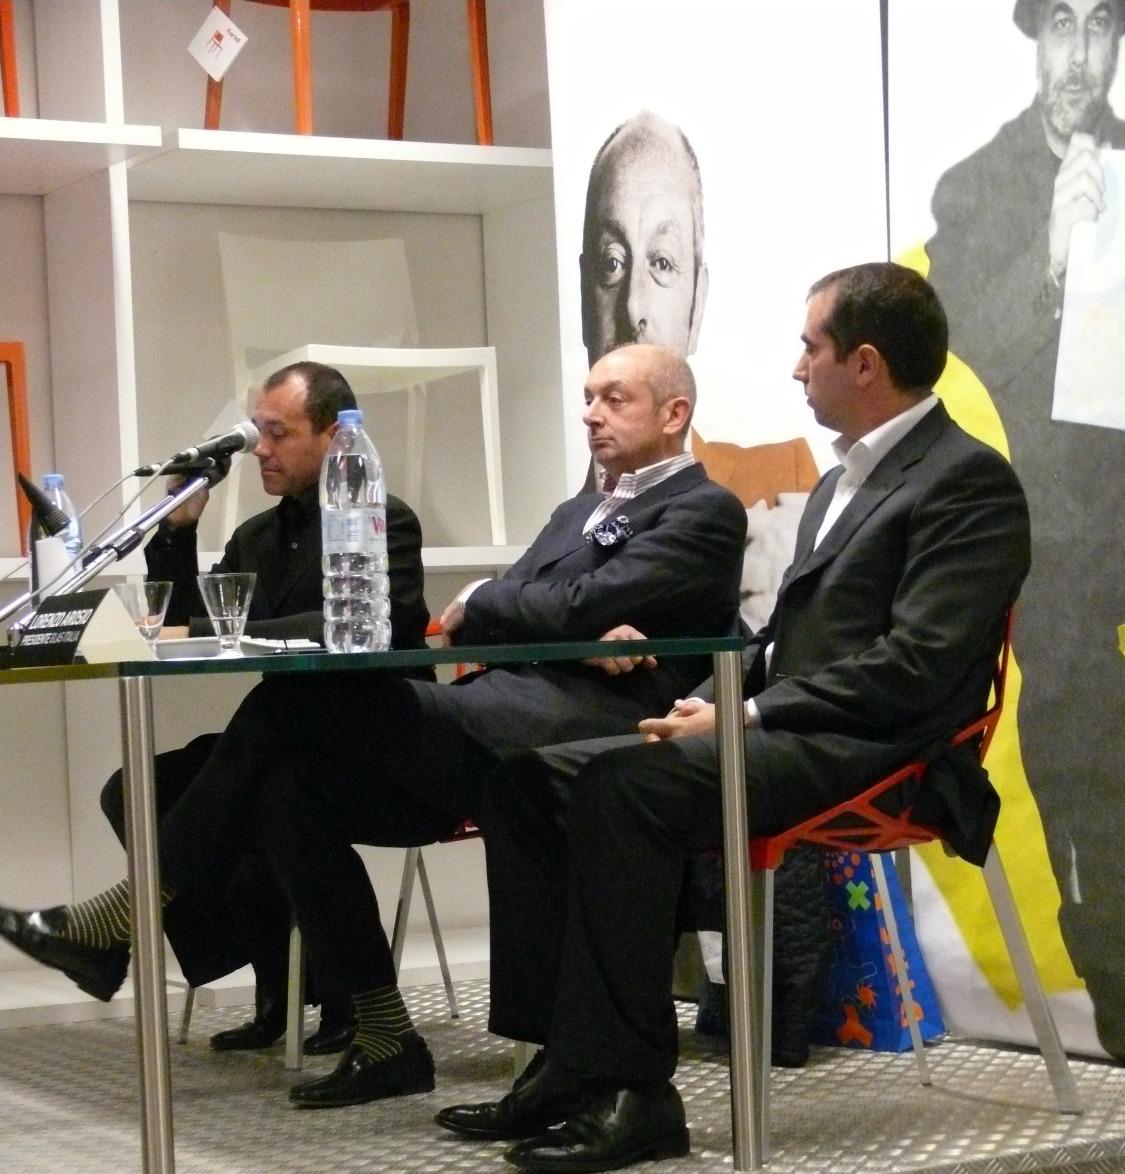 Conferência com Piero Lissoni